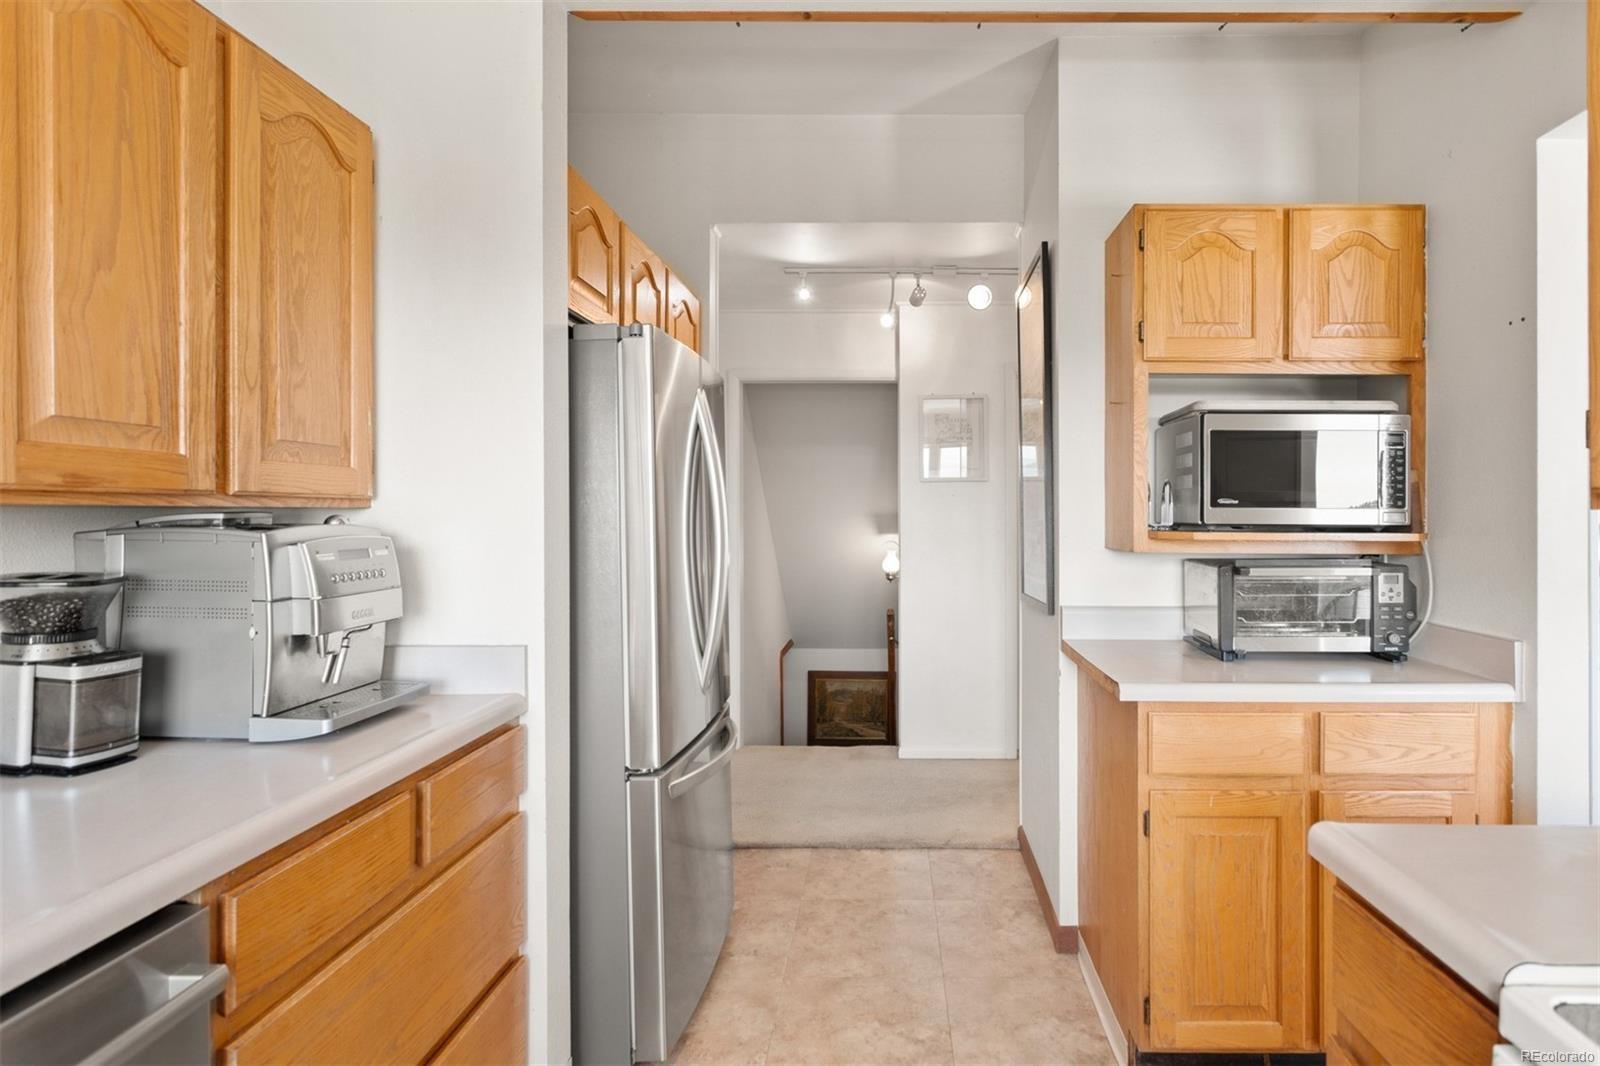 MLS# 6406927 - 6 - 2794 Lee Hill Drive, Boulder, CO 80302